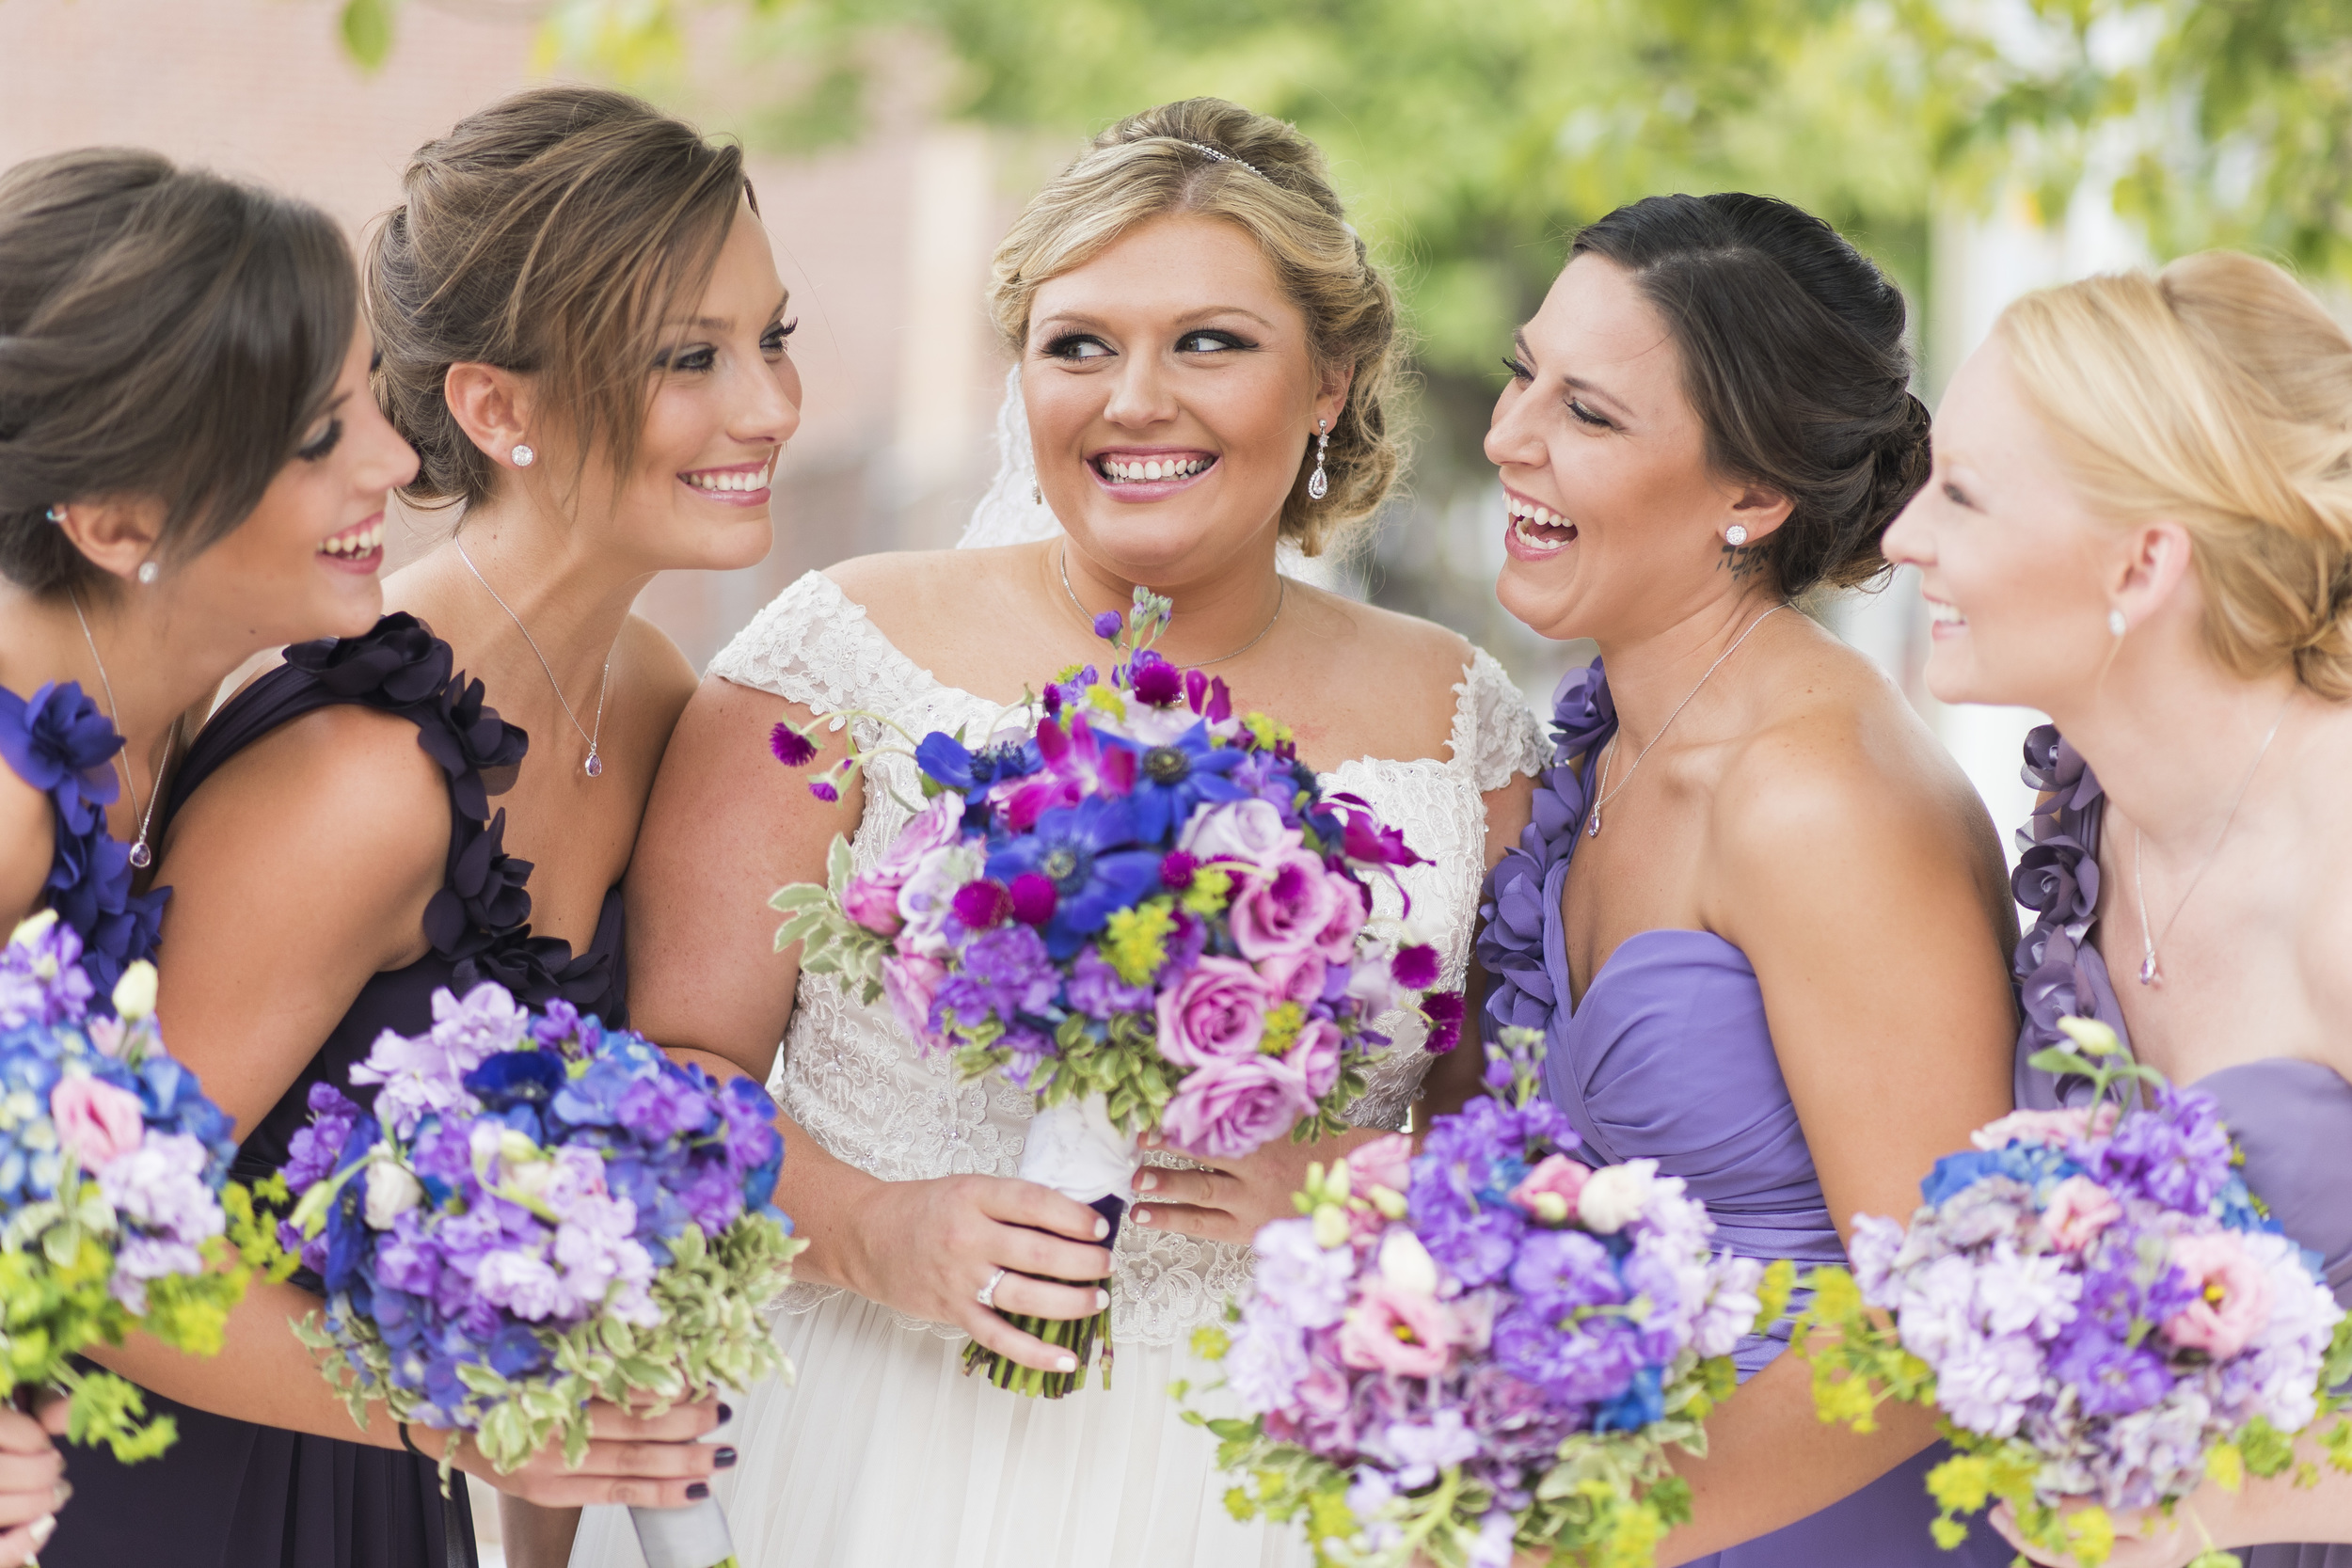 Lynchburg_VA_Wedding_Tresca on 8th_Downtown_Purple_elegant_Photos869.jpg